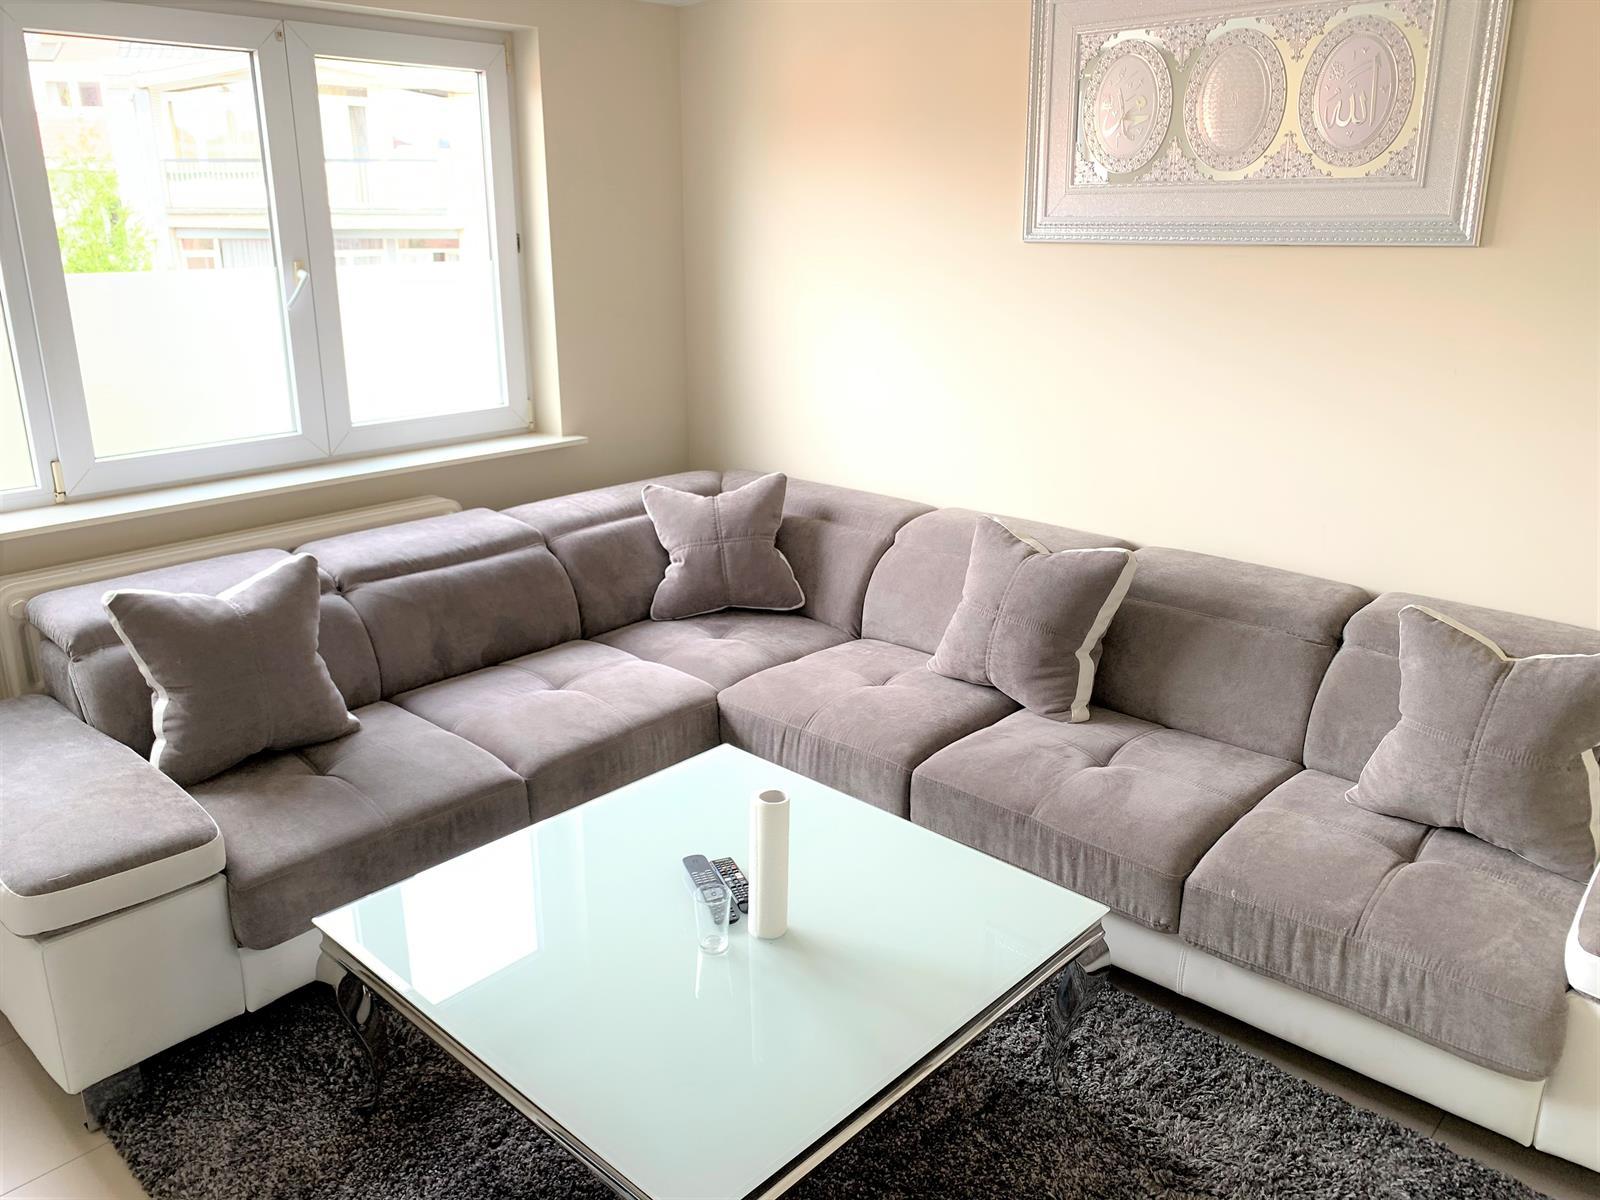 Appartement - Woluwe-Saint-Lambert - #4286376-11